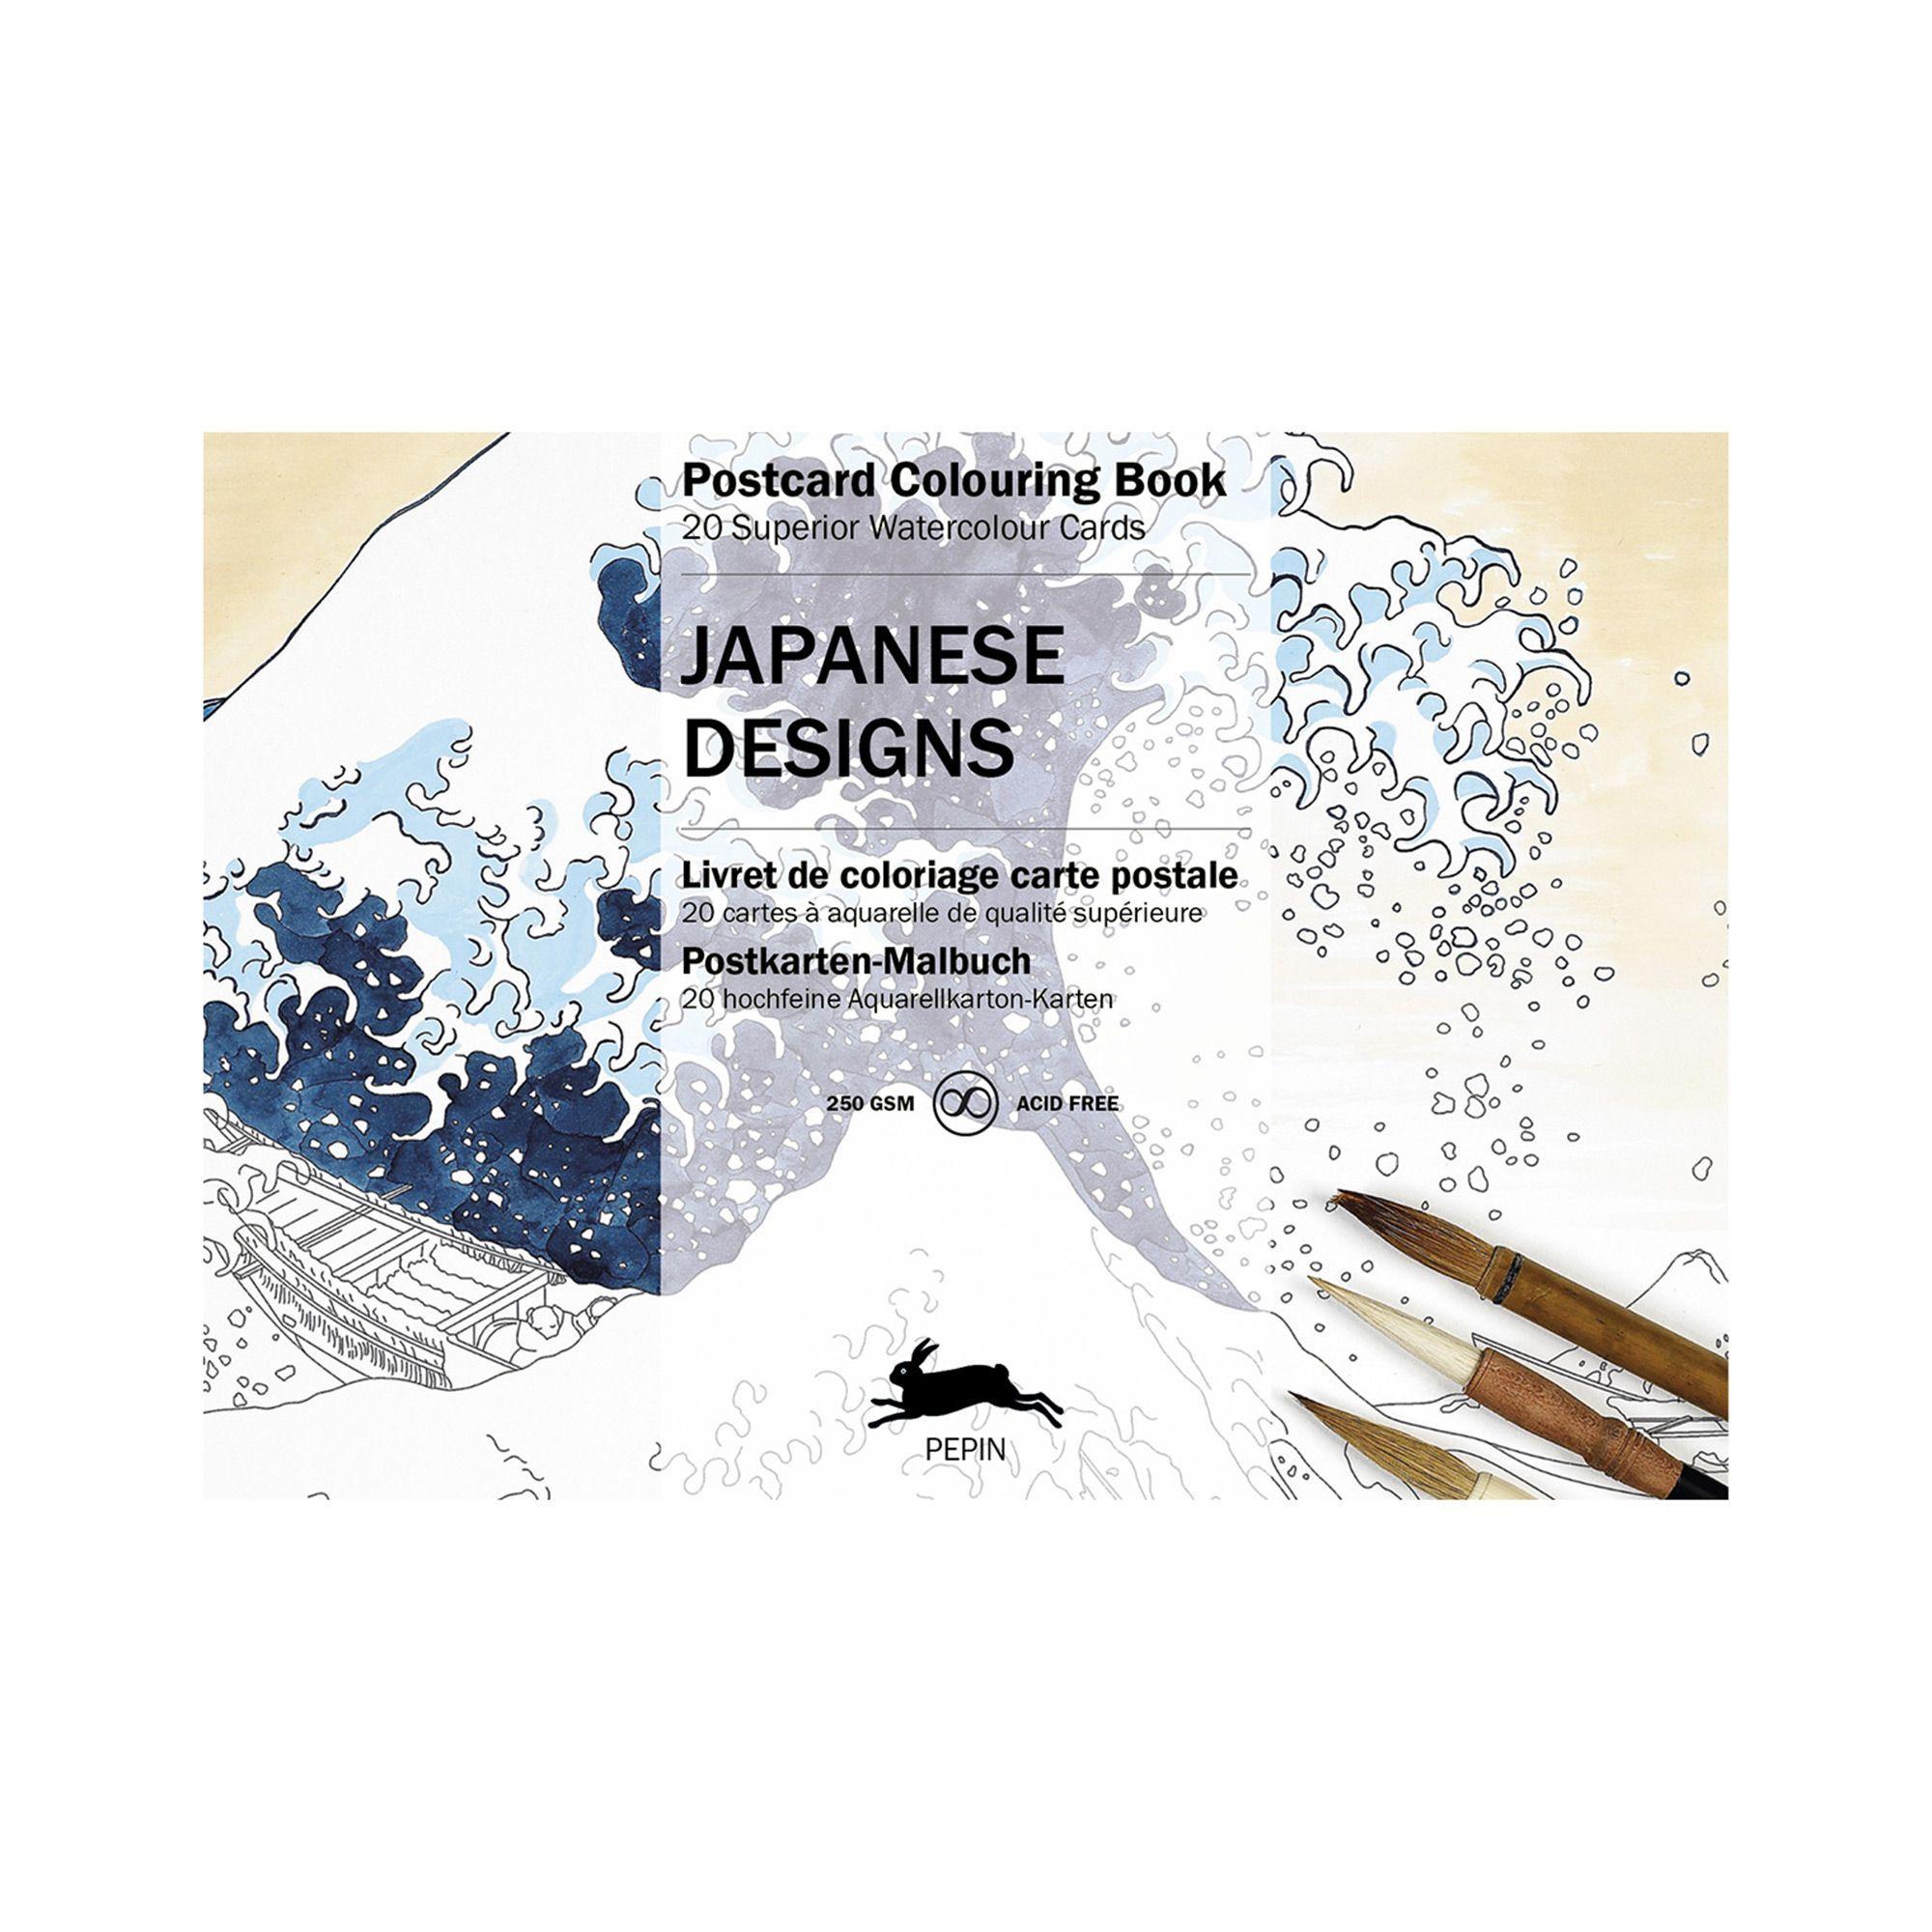 Postcard Colouring Book Japanese Designs Coloring Books Japanese Design Japanese Watercolor